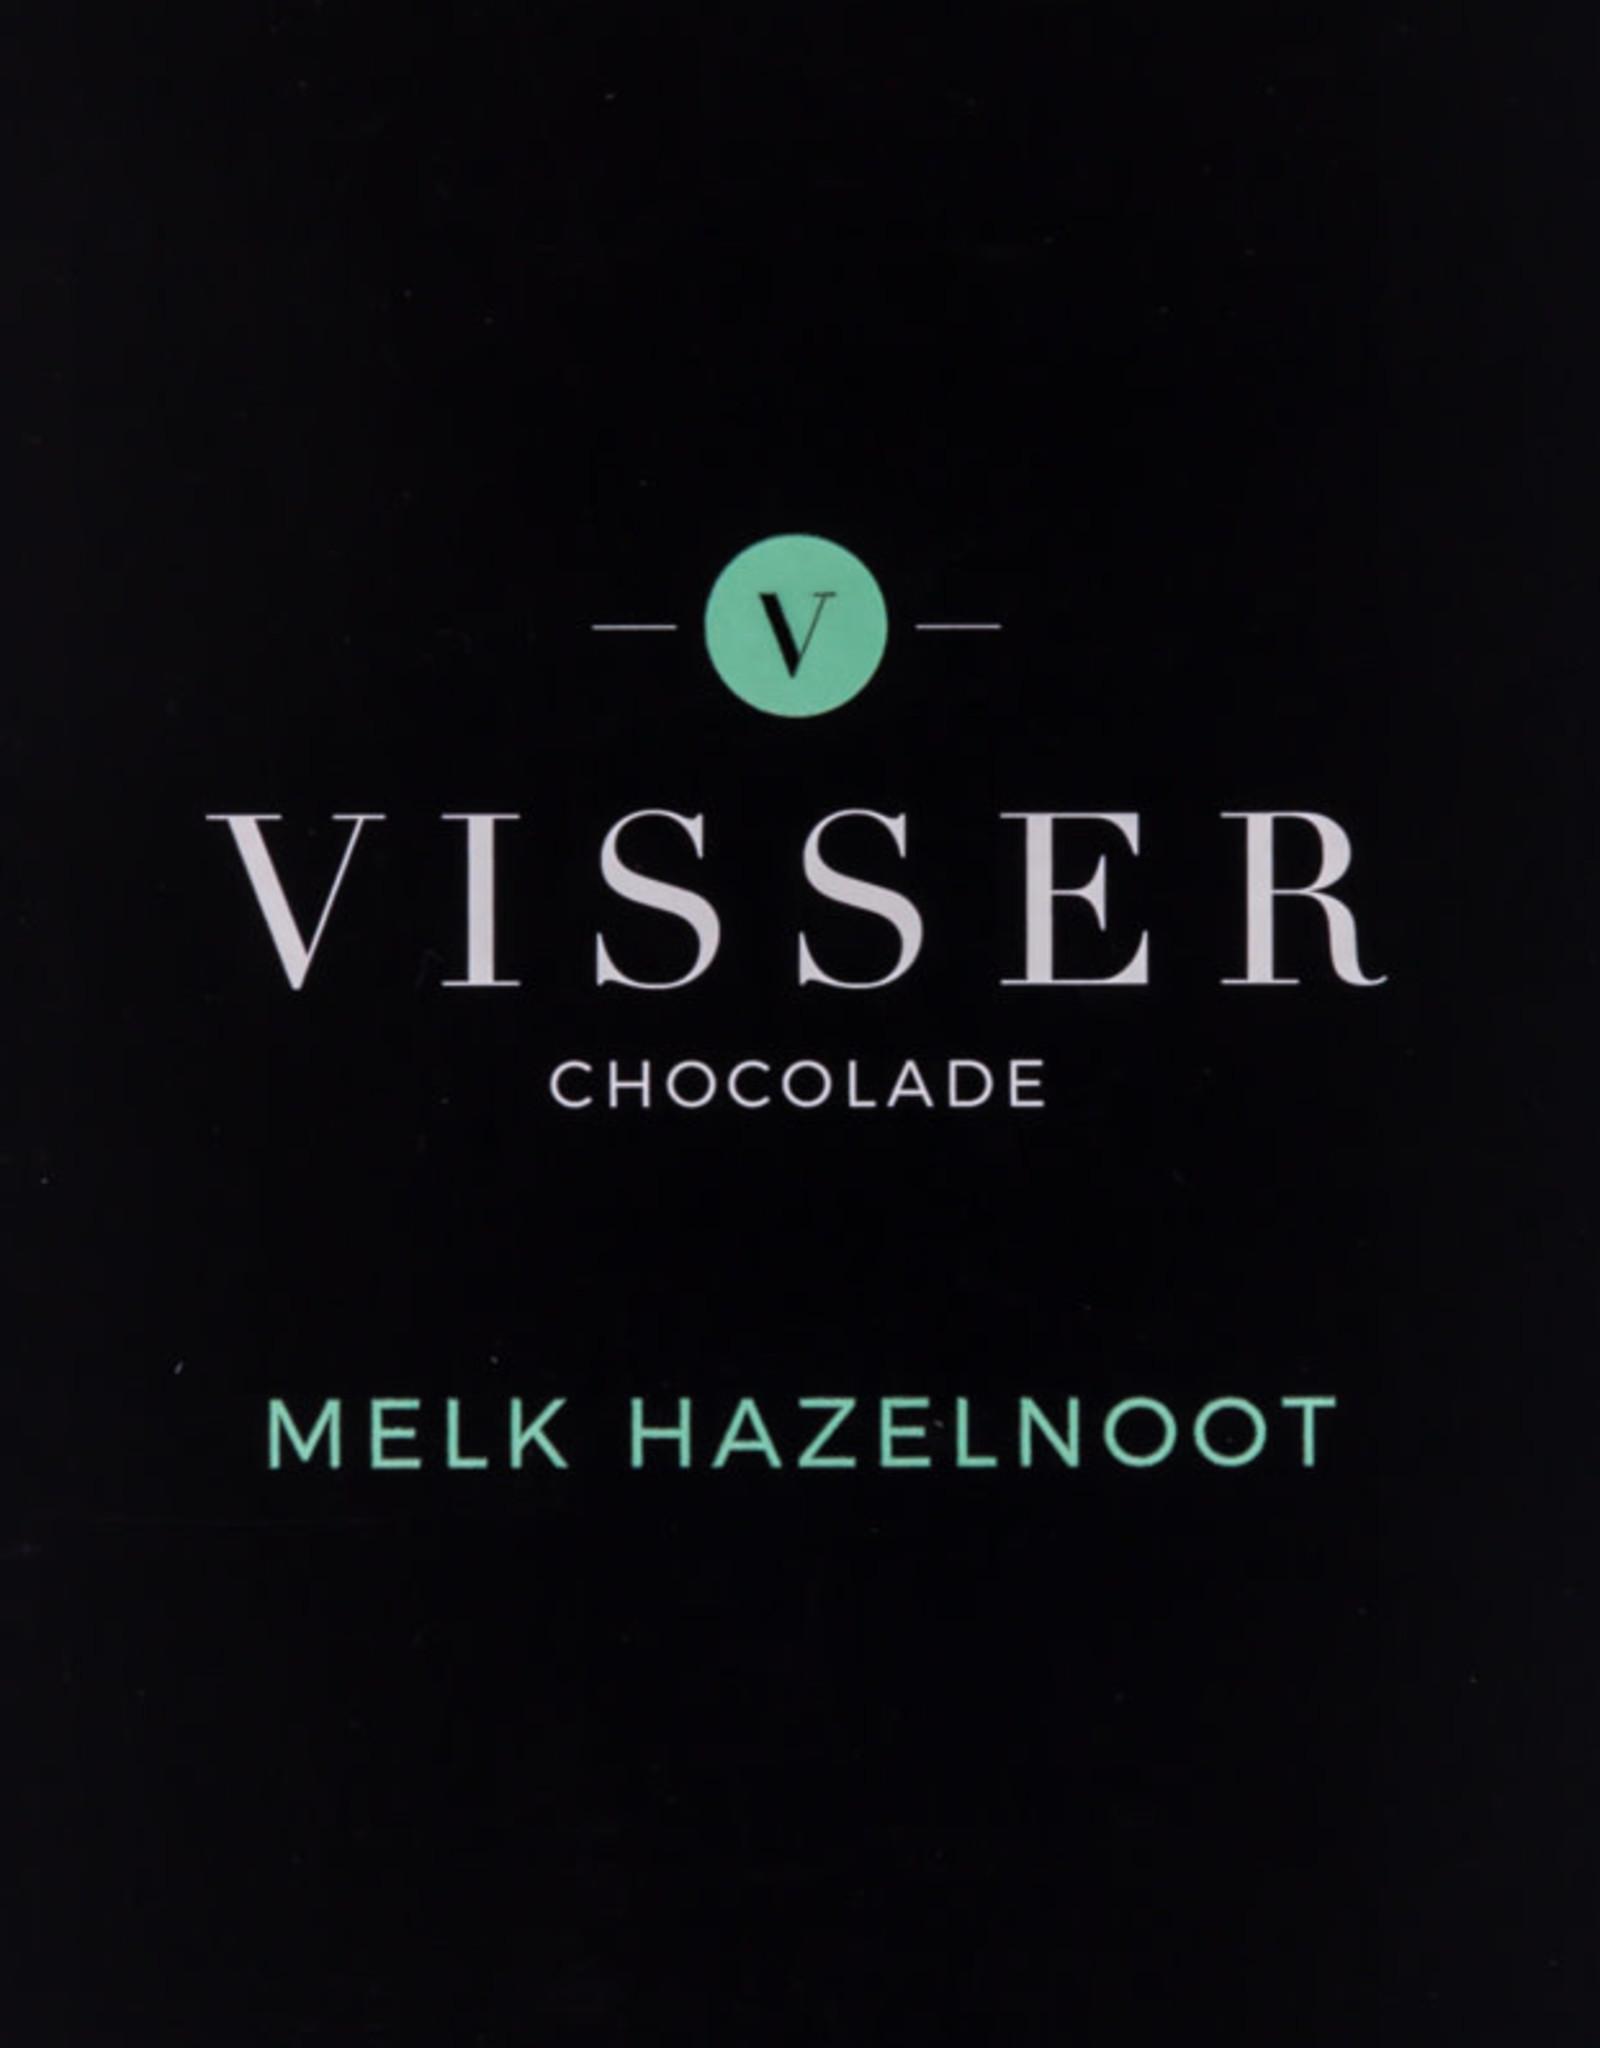 Visser Chocolade Melk Hazelnoot